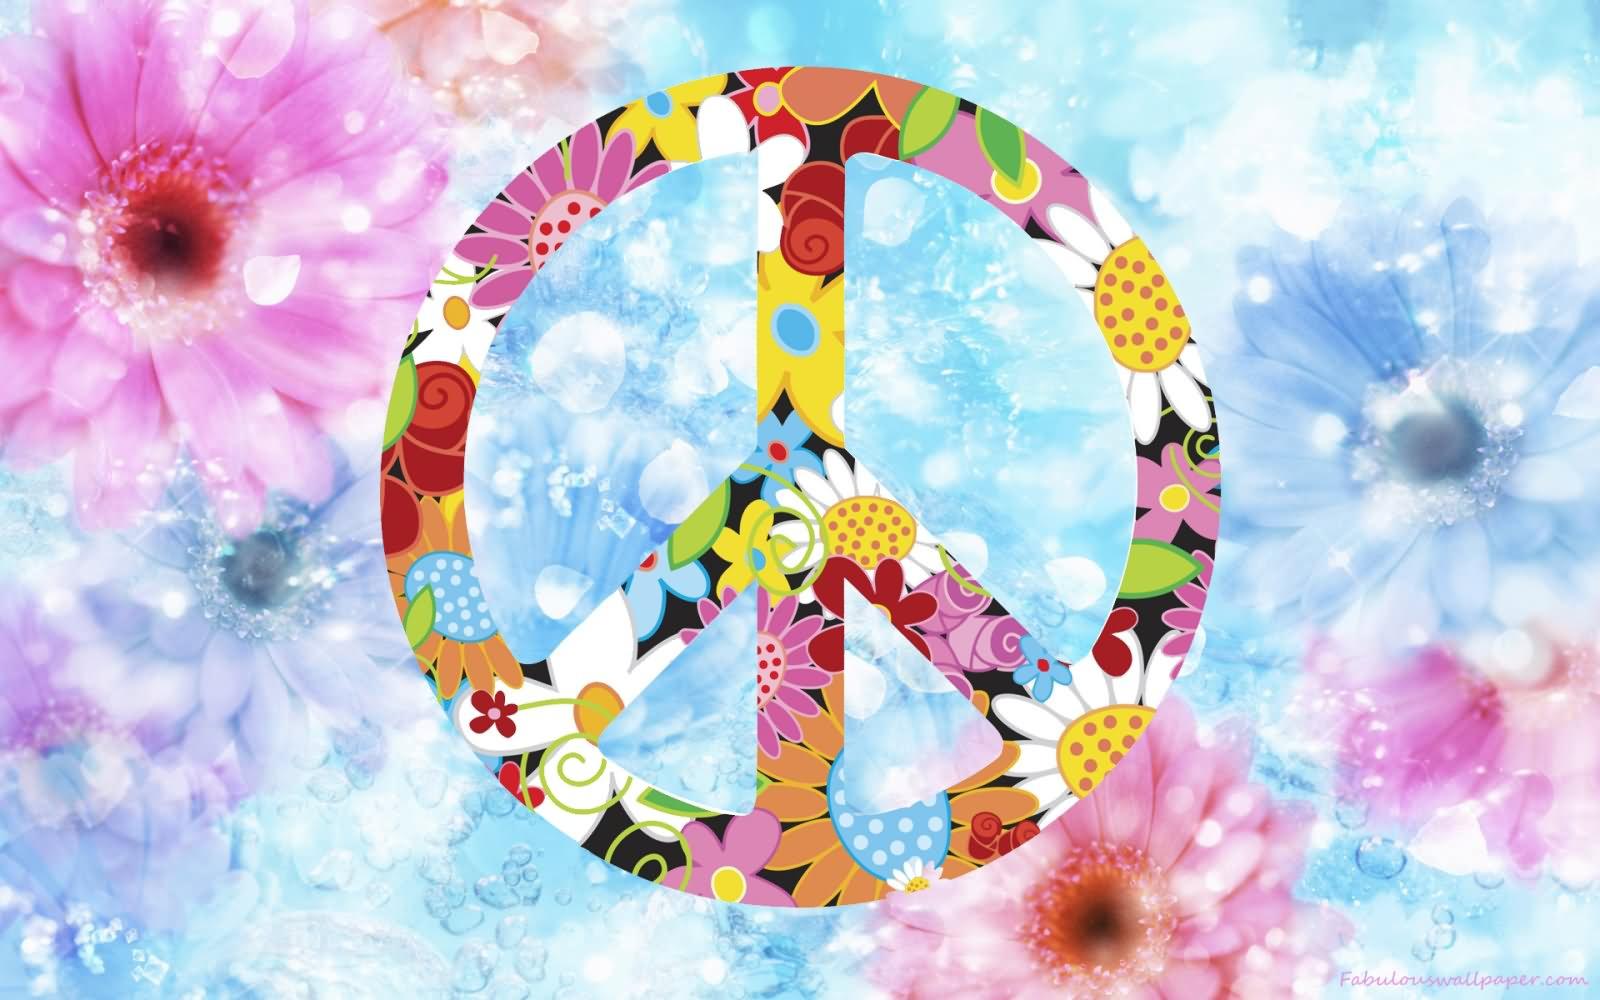 International Day of Peace Wallpaper 12   1600 X 1000 stmednet 1600x1000